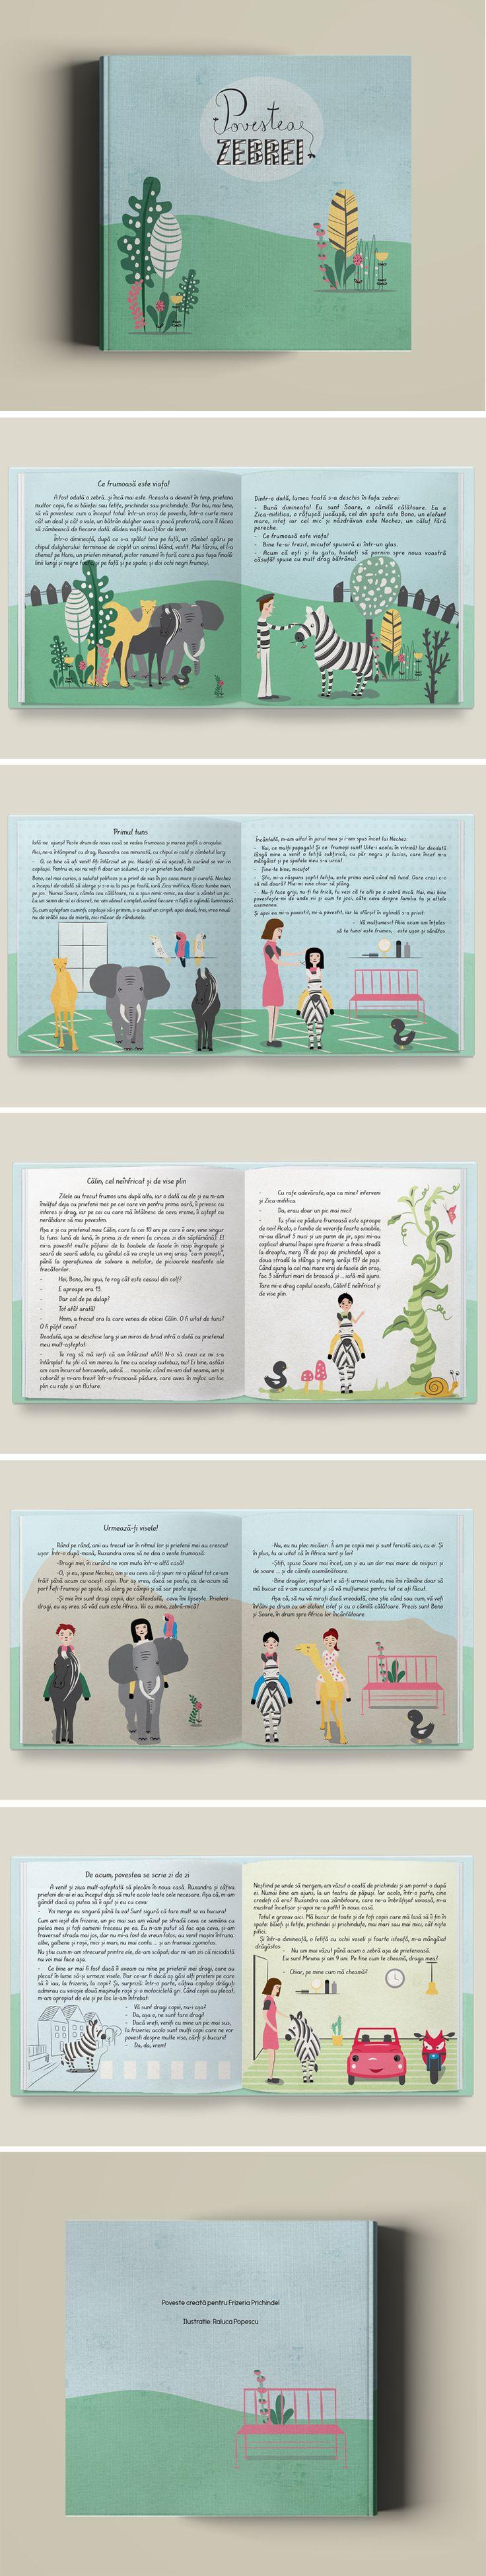 The story of a zebra- book illustration